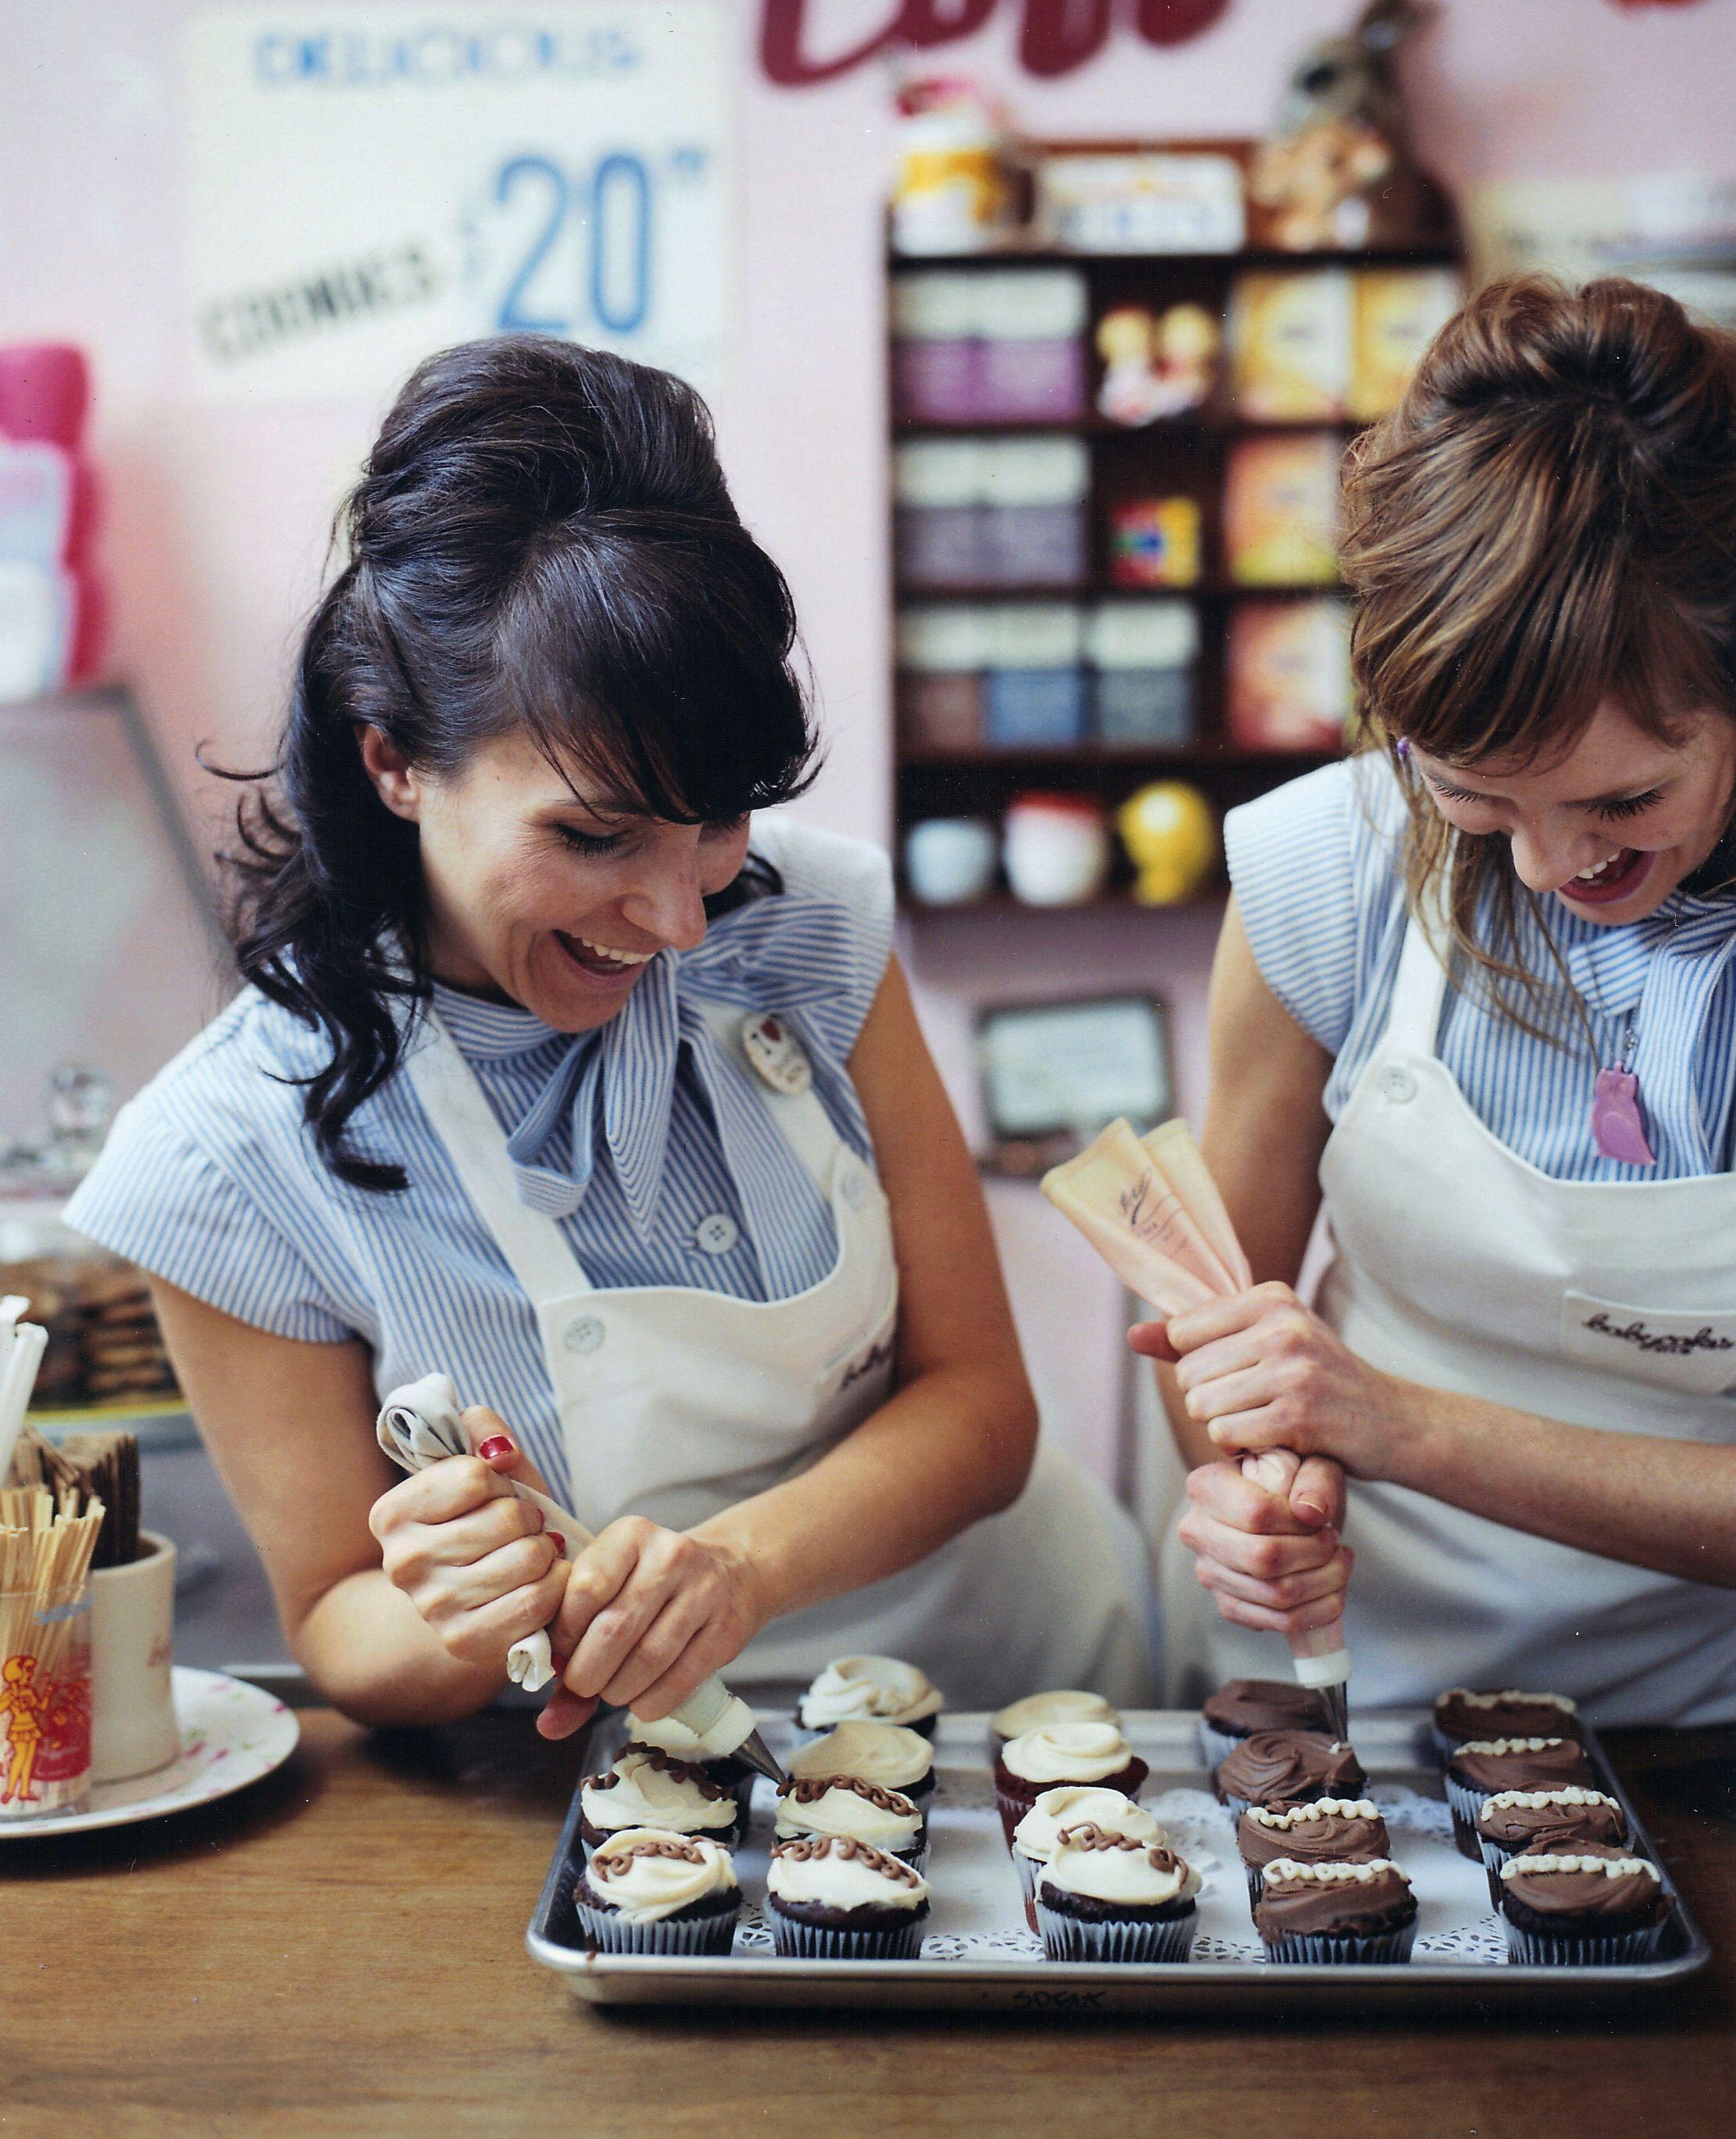 Babycakes girls piping curlicues onto cupcakes cupcake